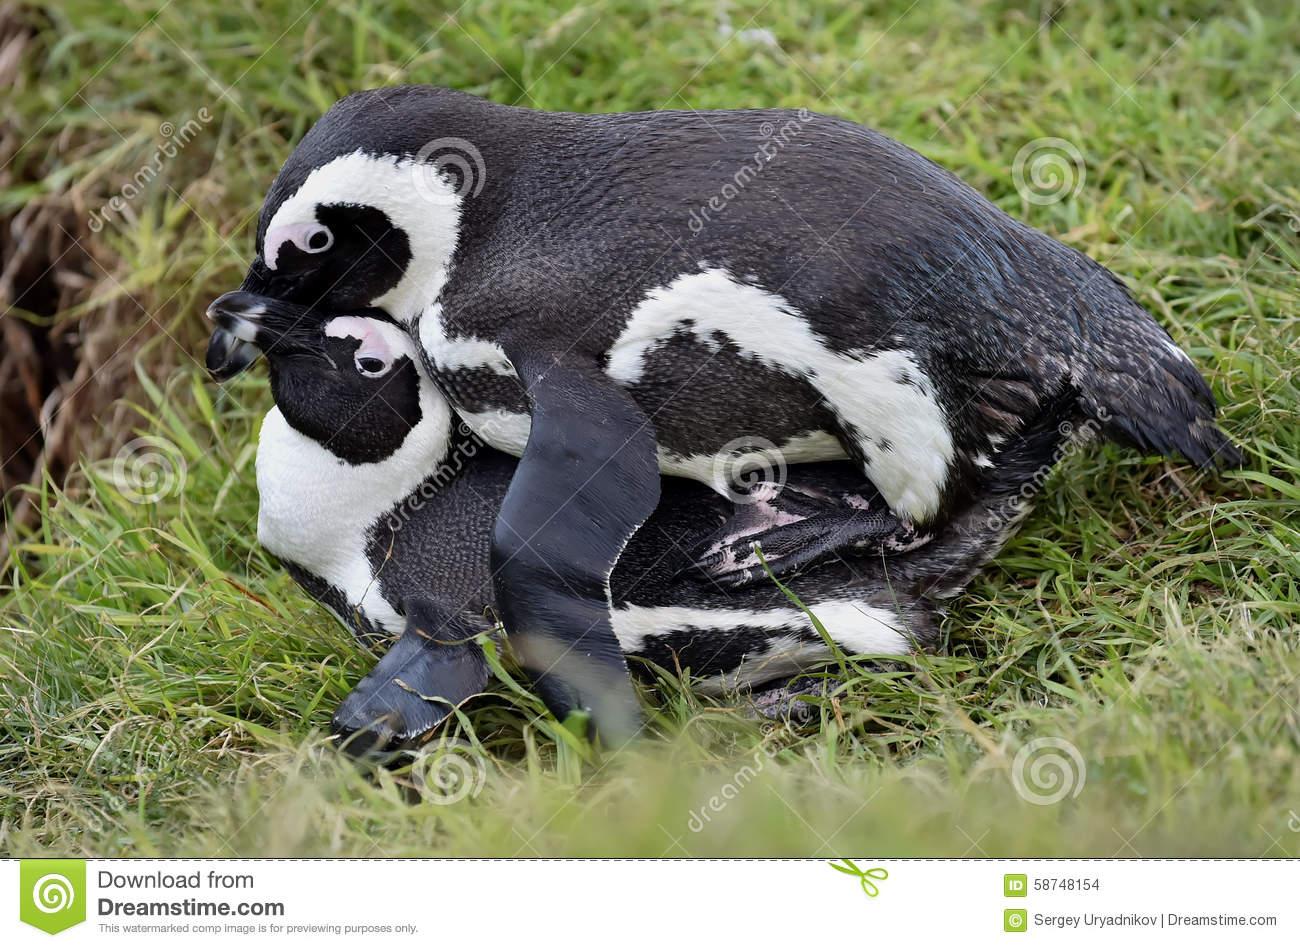 Mating Penguins (Spheniscus Demersus) (African Penguins). Stock.